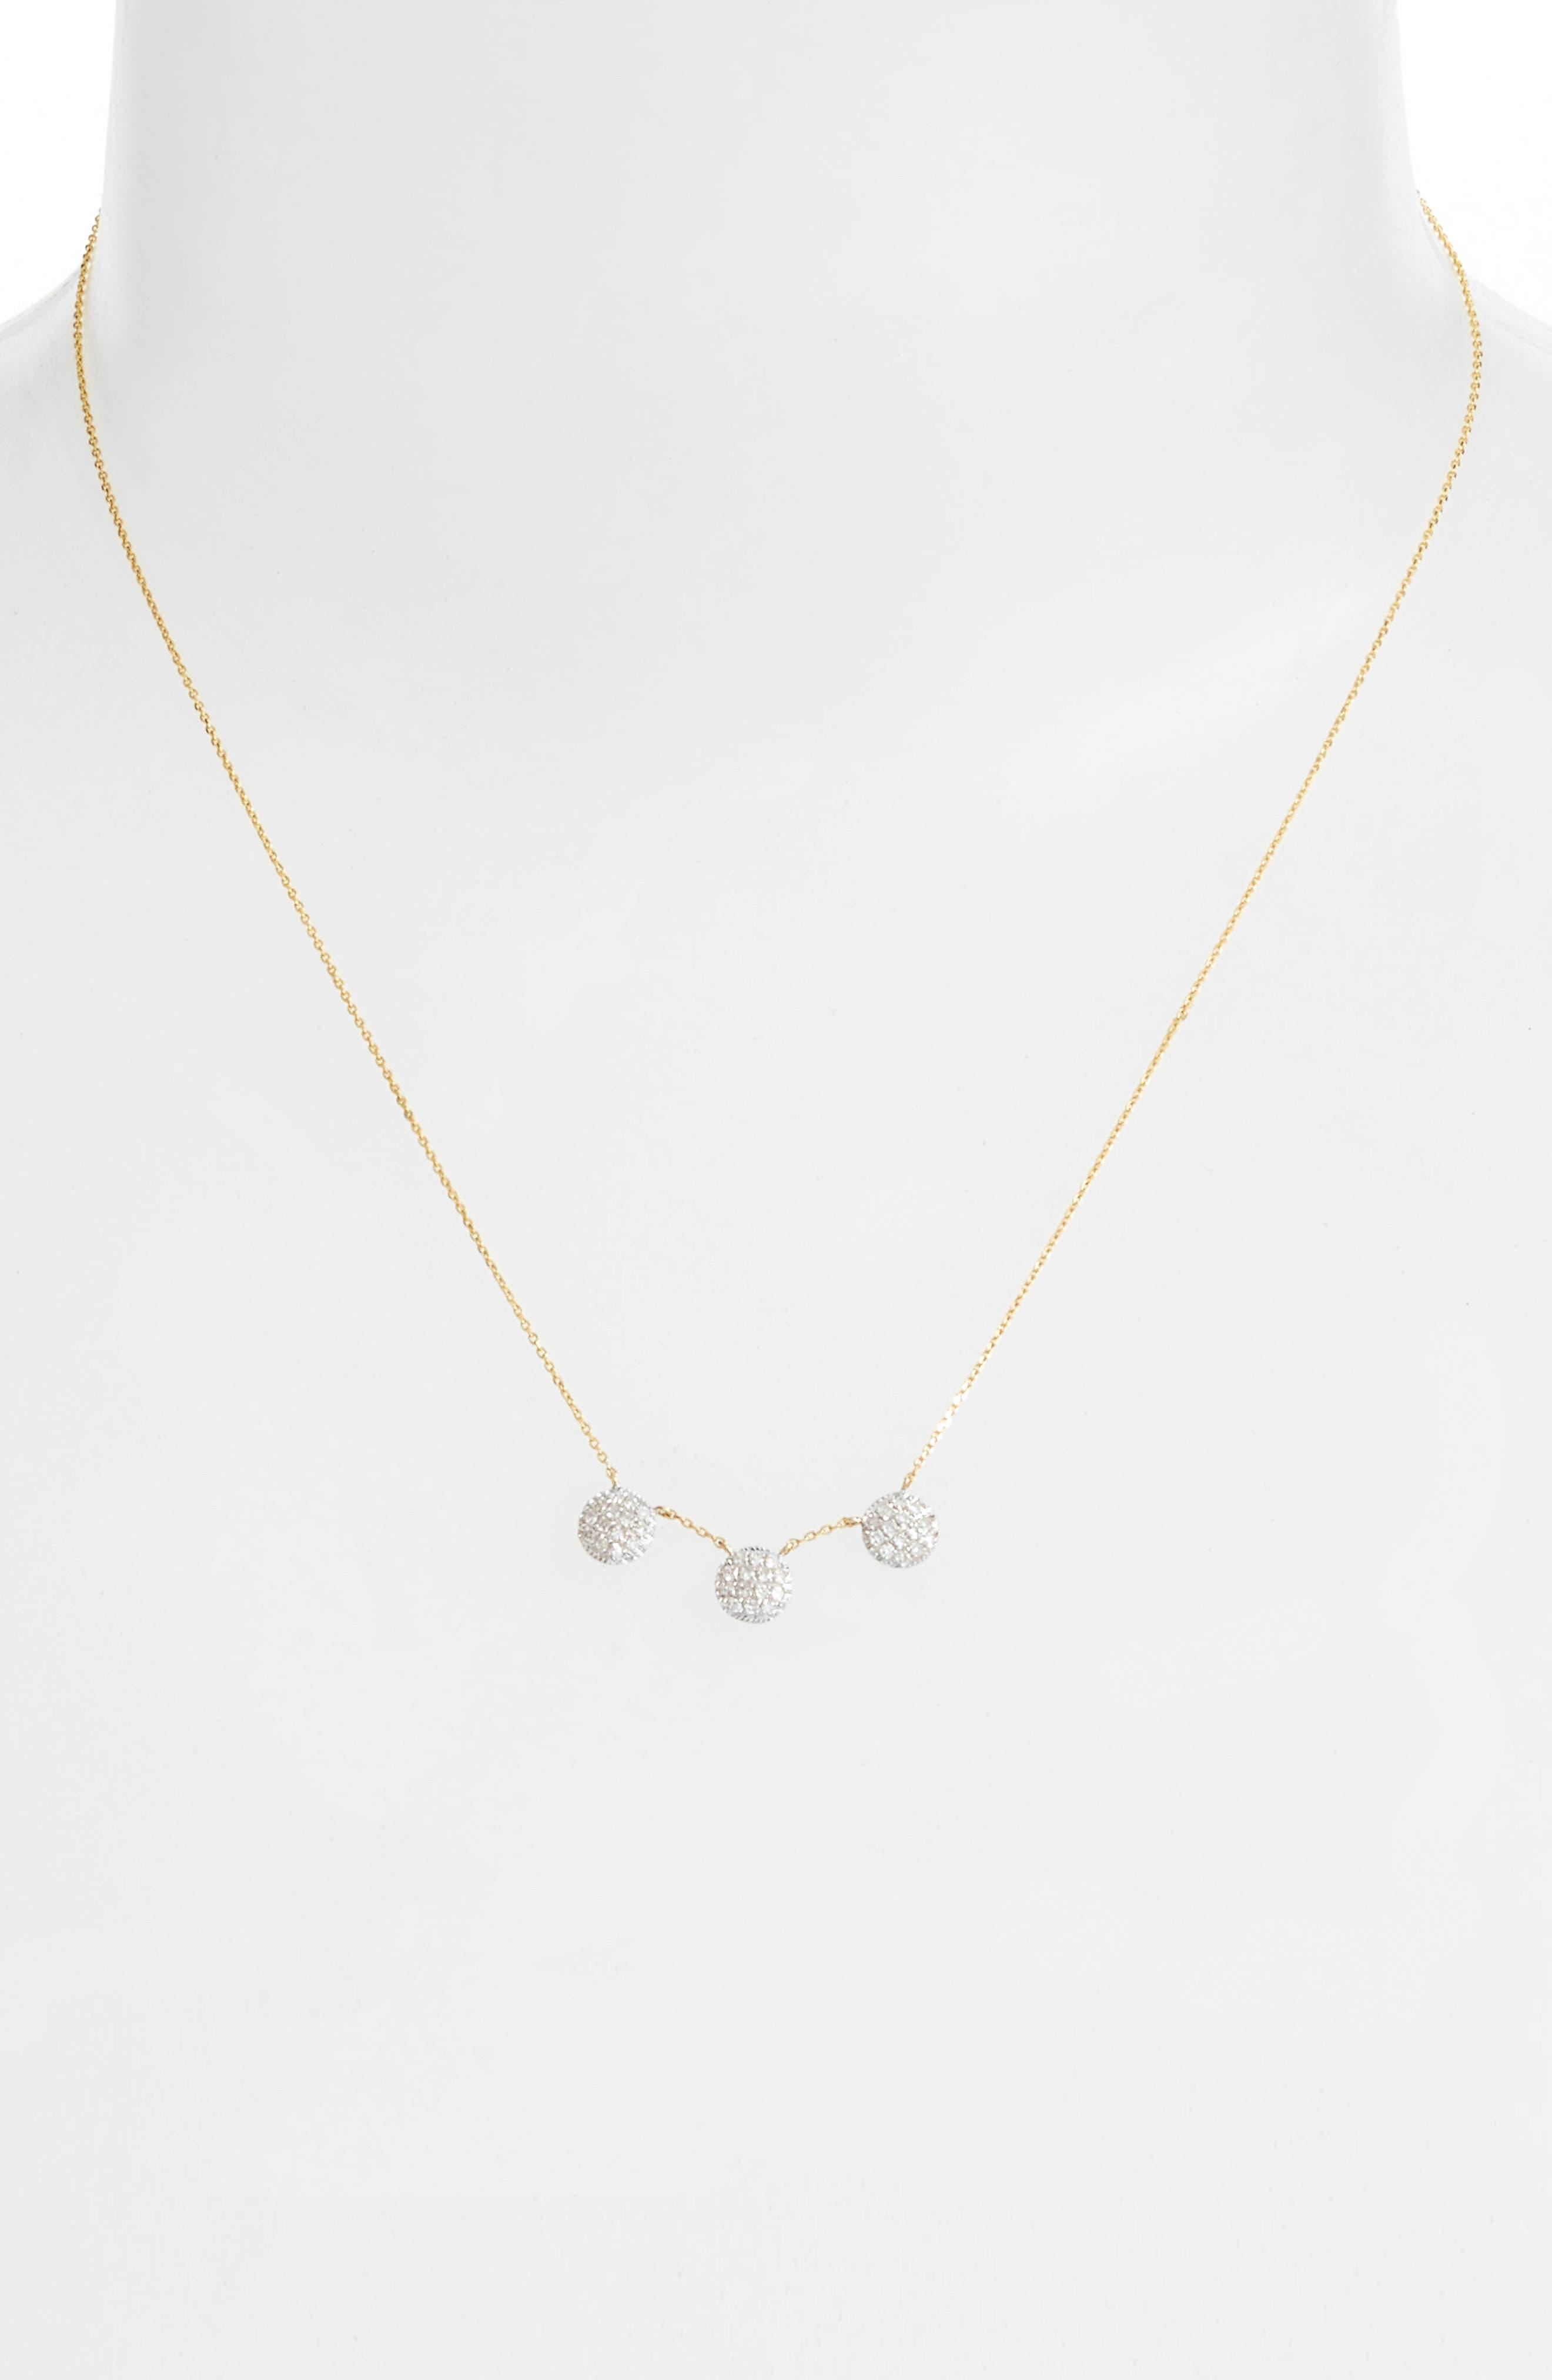 Lauren Joy Three-Disc Diamond Necklace,                             Alternate thumbnail 2, color,                             710